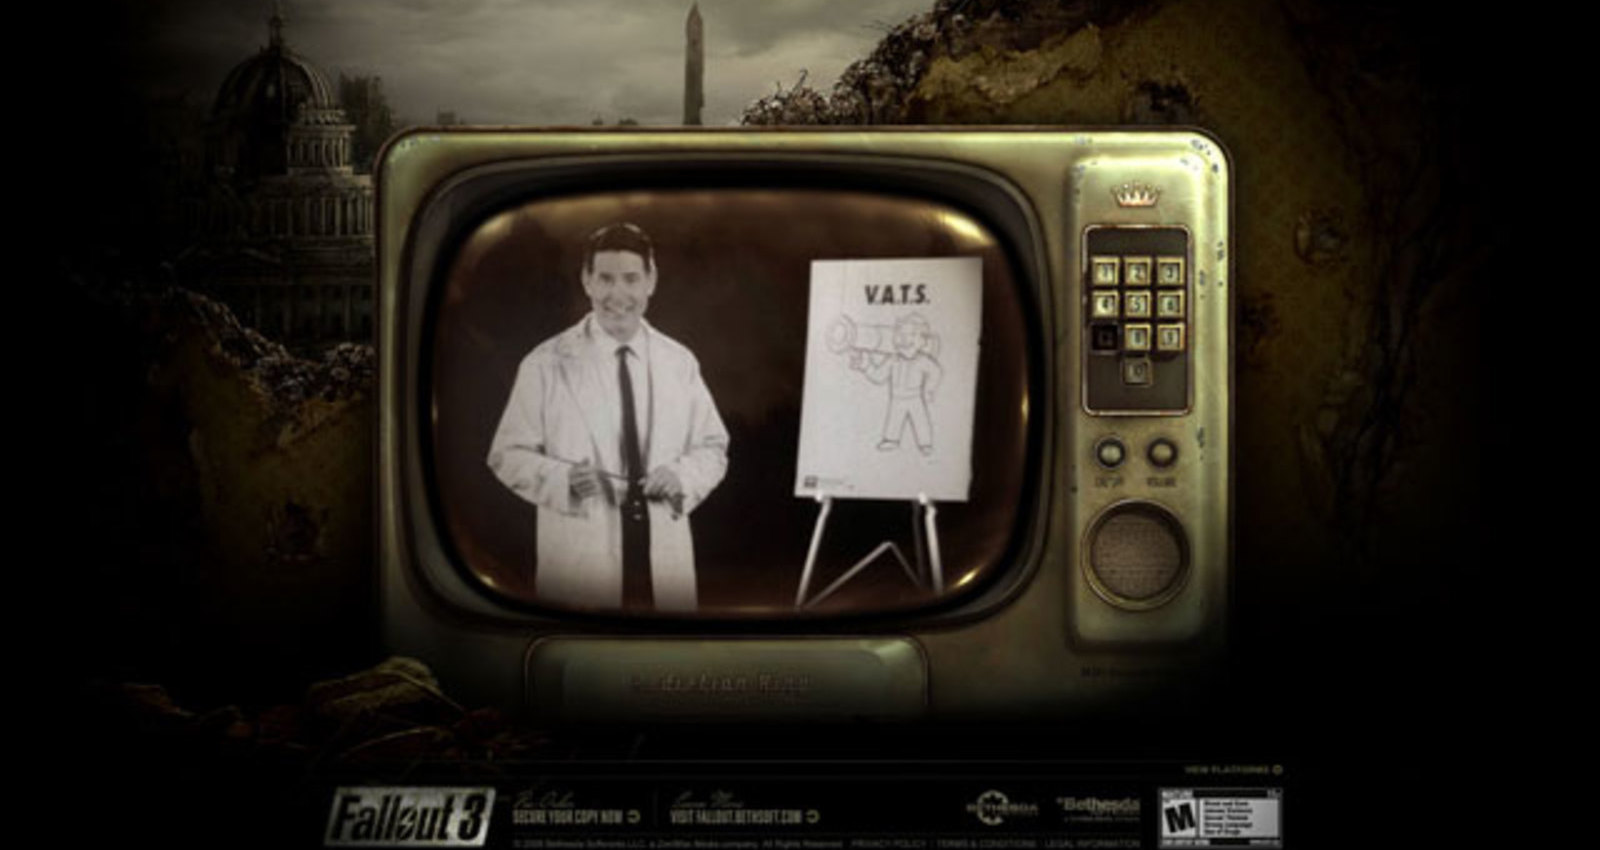 Fallout 3 PrepareForTheFuture.com